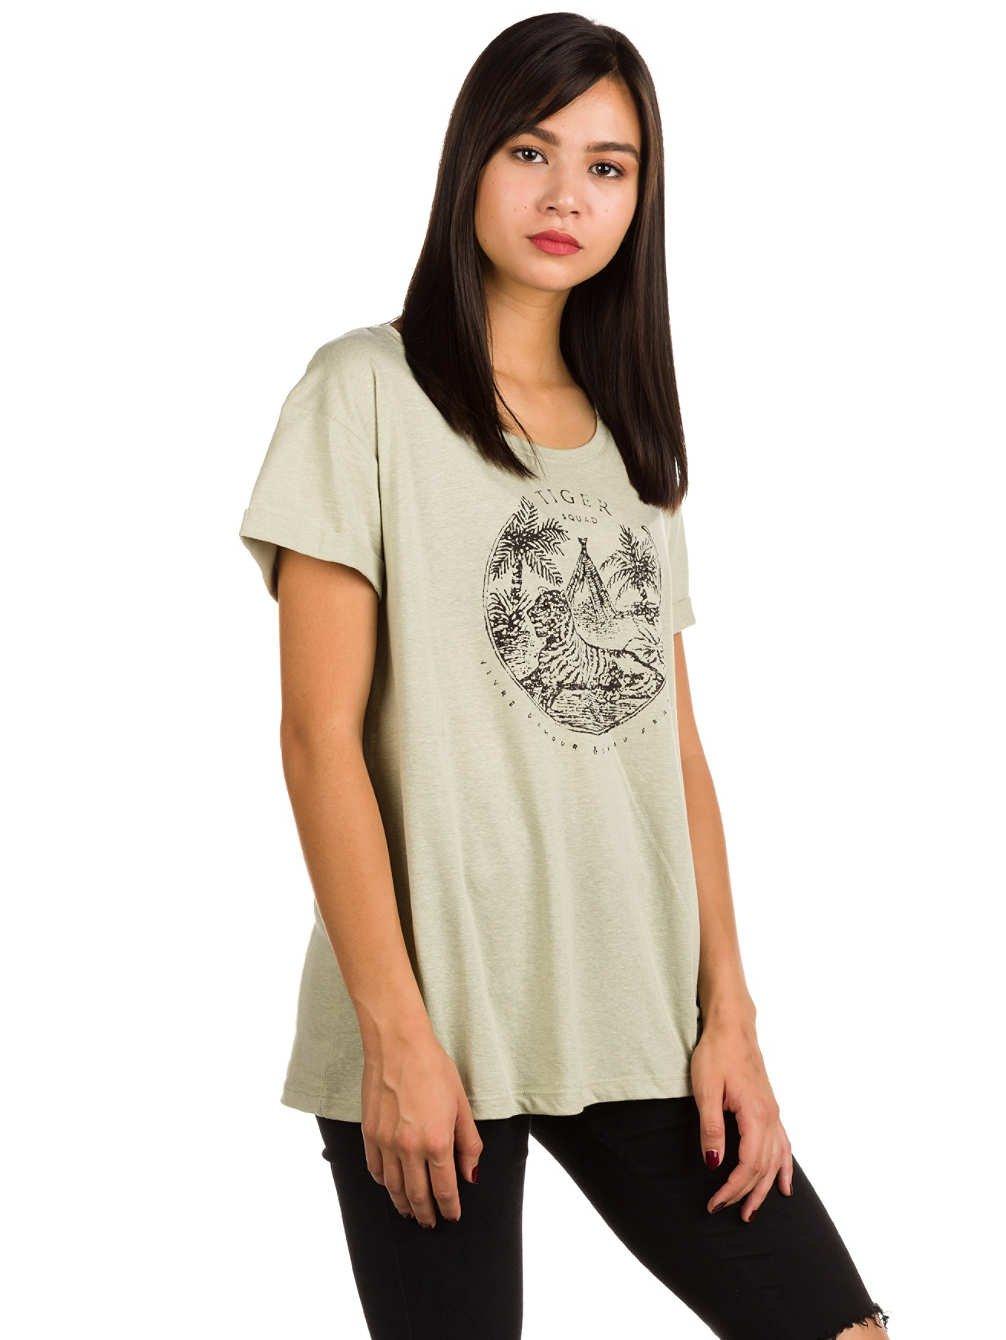 Roxy Alex Palm Tiger Squad – Camiseta para Mujer ERJZT04049